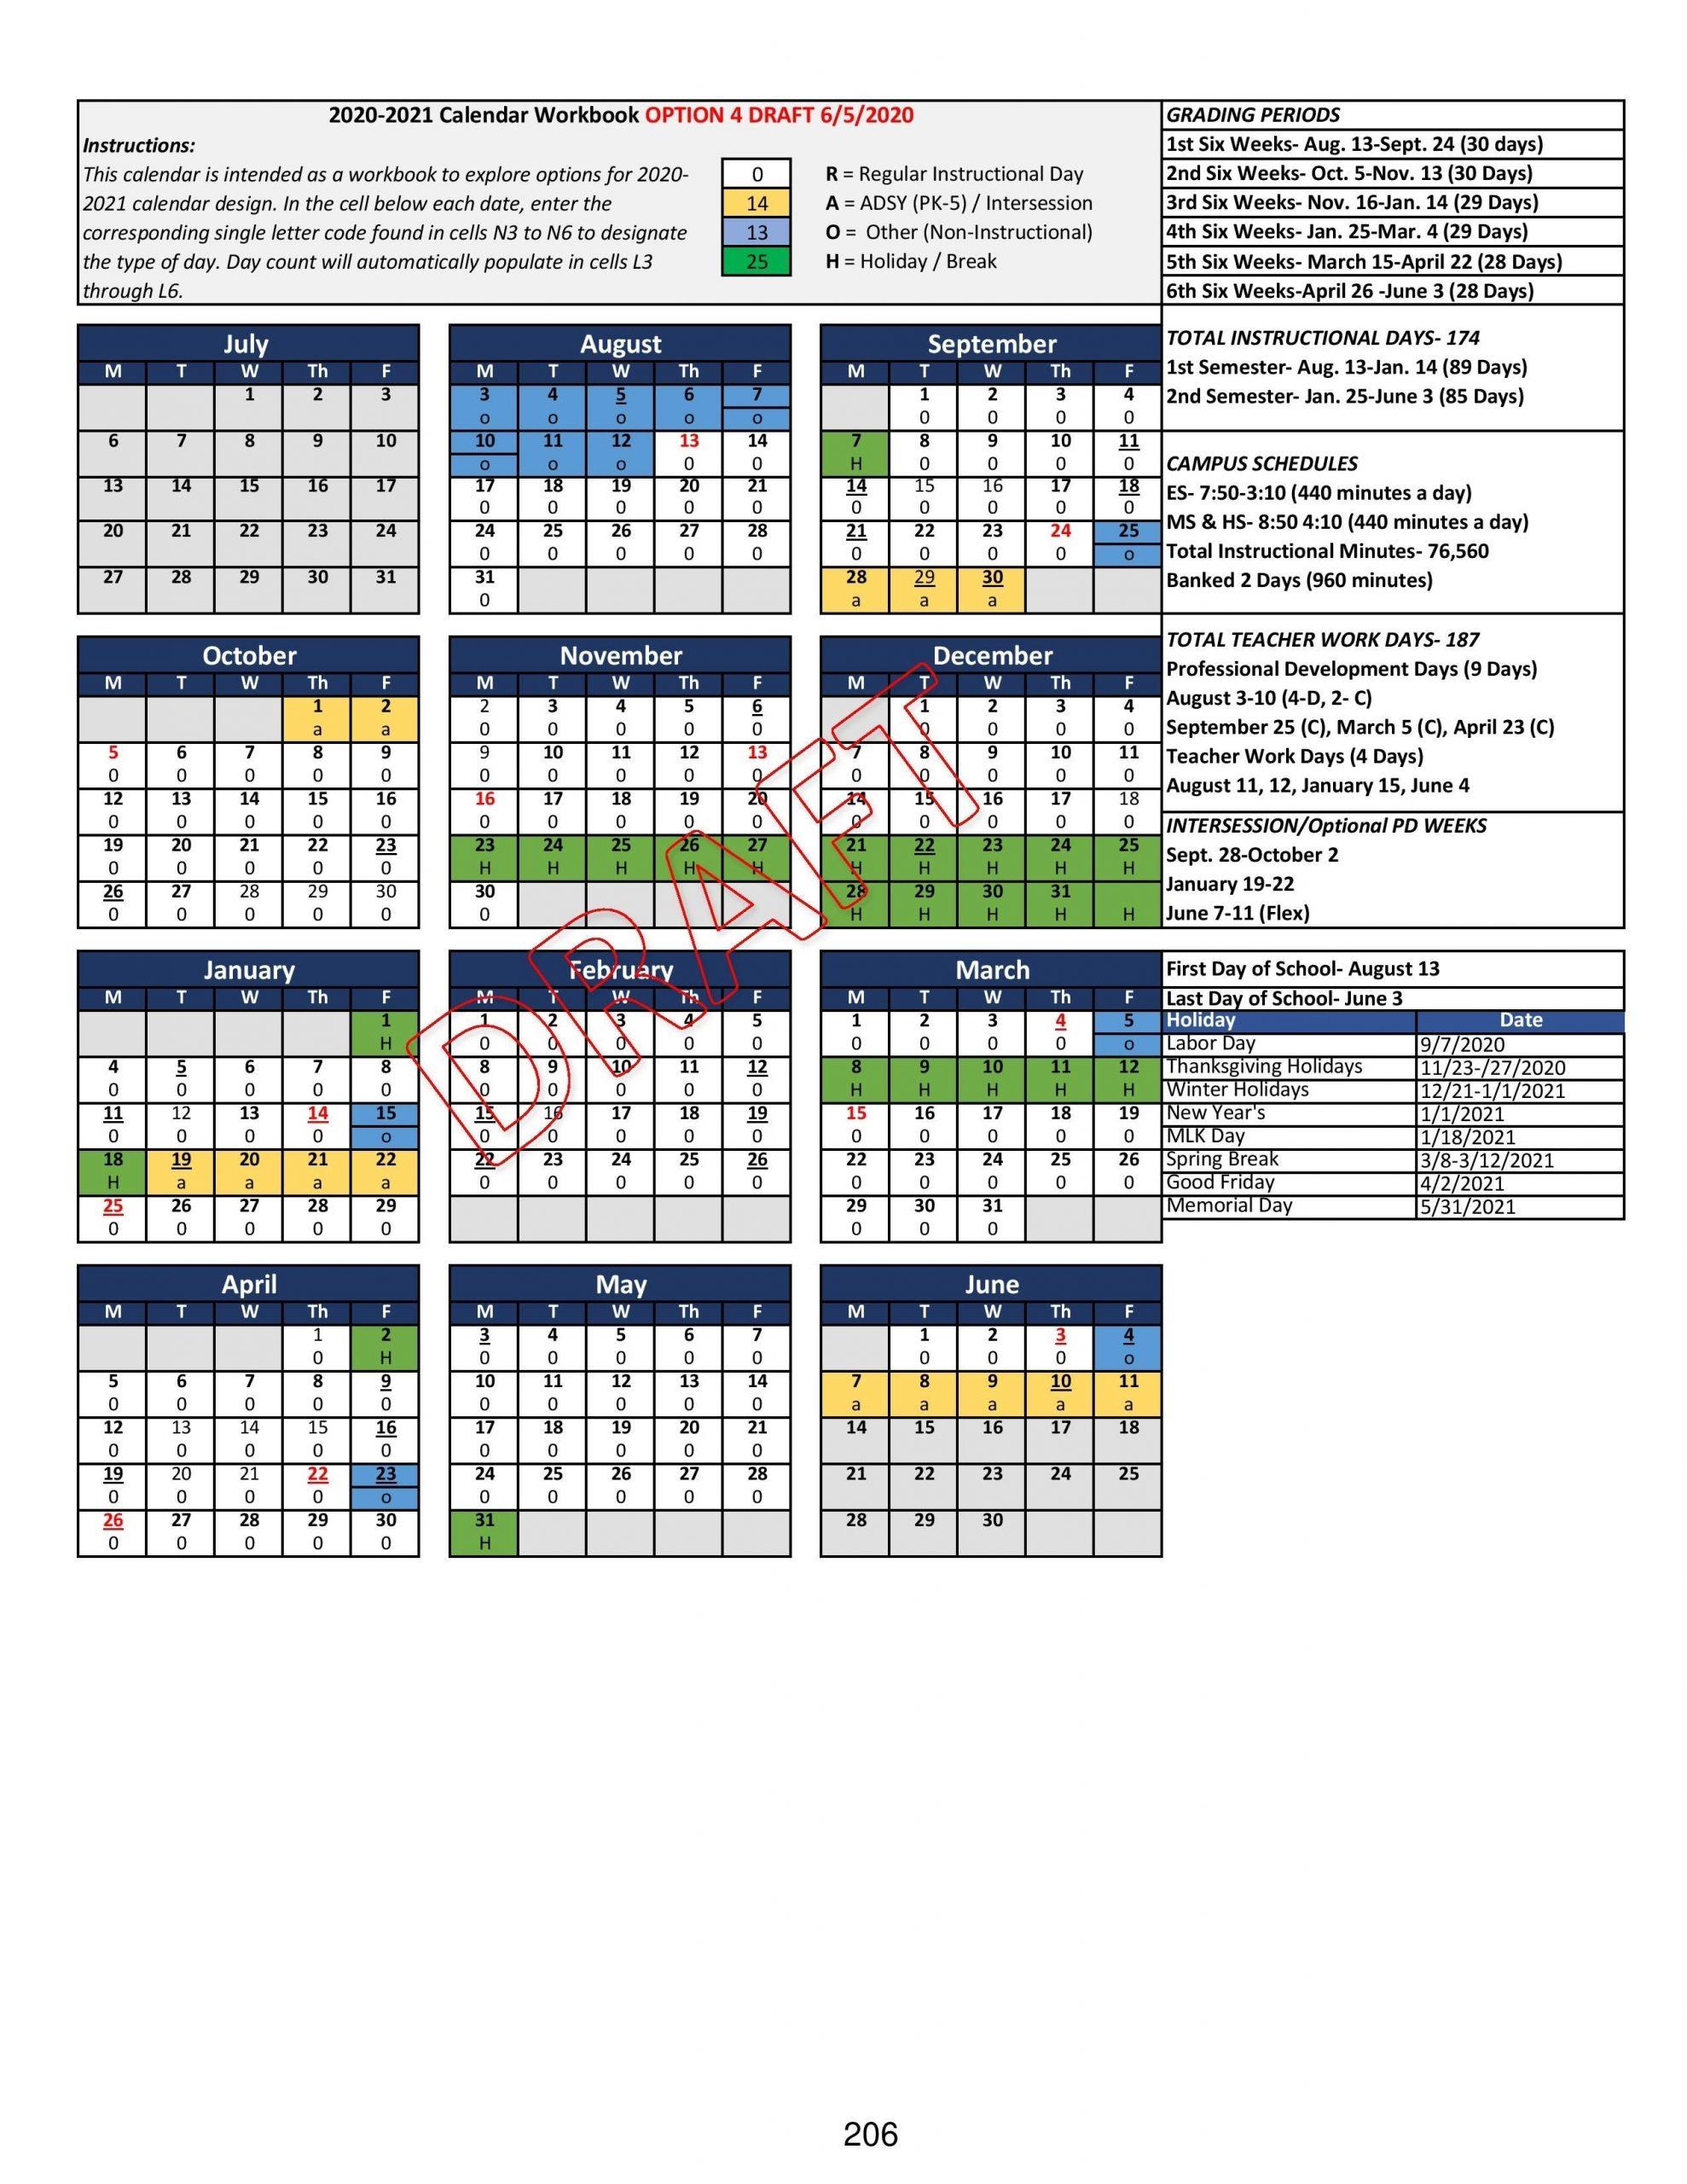 Take Mid Del Pulic Schools Fall 2021 Calendar